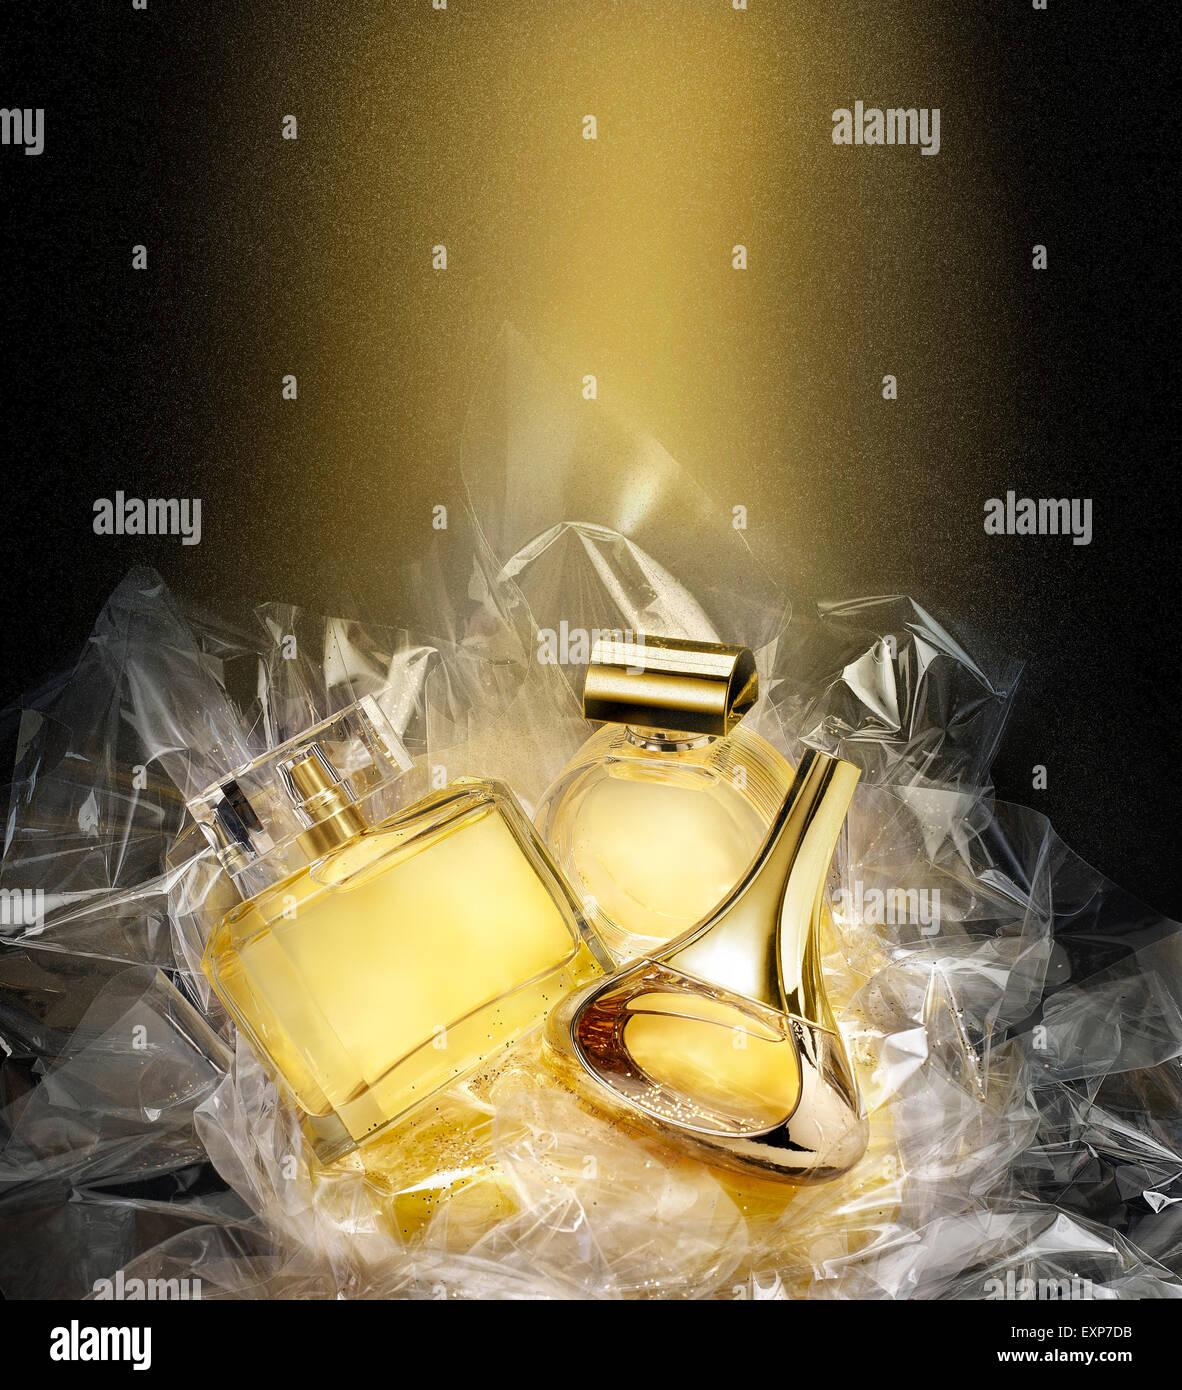 Fine Fragrances In A Concept Gift Set Christmas Fantasy Environment Stock Photo Alamy